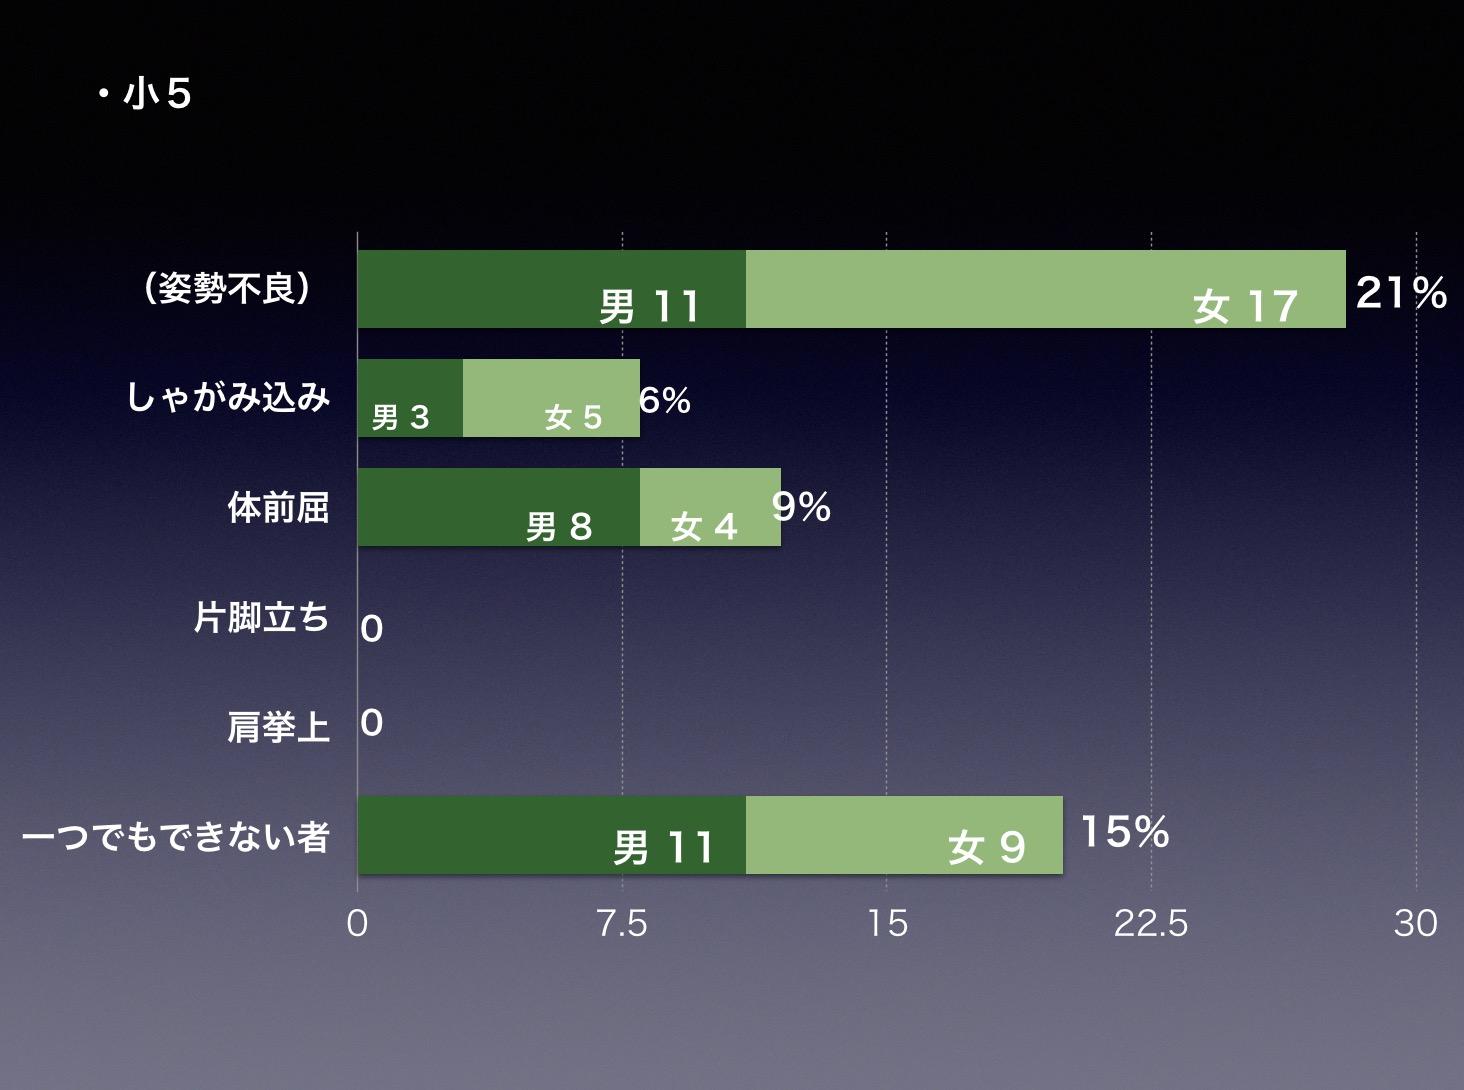 %e3%82%b9%e3%82%af%e3%83%aa%e3%83%bc%e3%83%b3%e3%82%b7%e3%83%a7%e3%83%83%e3%83%88-2016-09-08-6-03-42